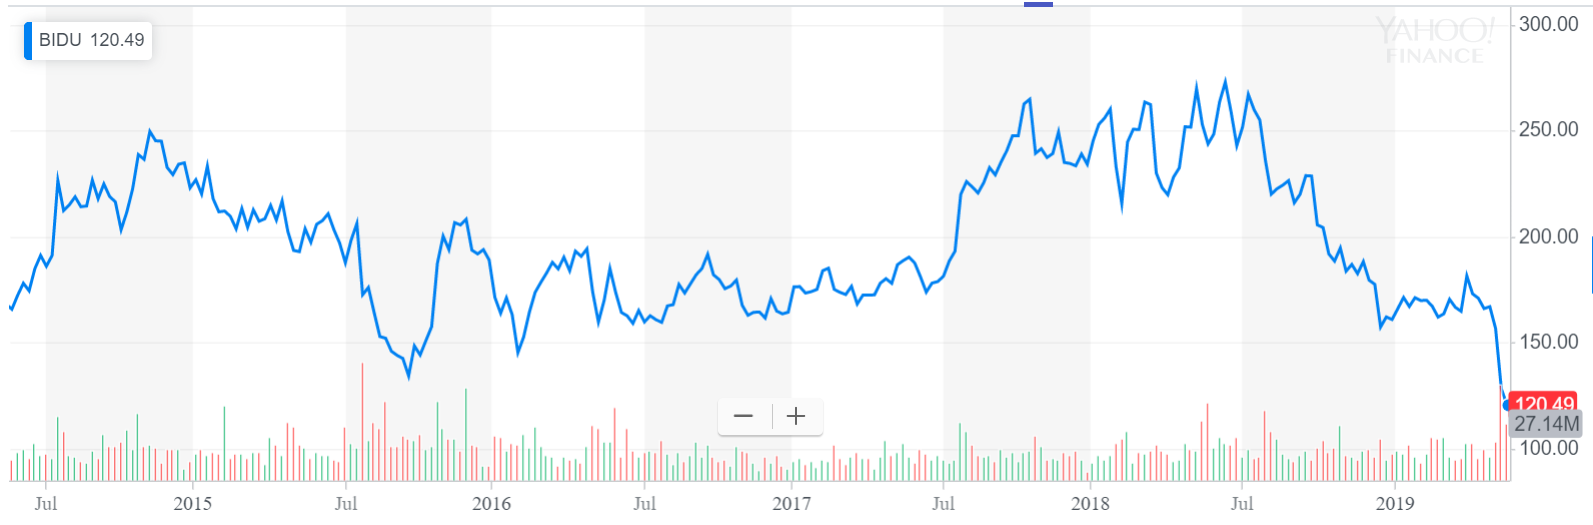 A Deep-Dive Into Baidu's Q1 Losses - Baidu, Inc  (NASDAQ:BIDU